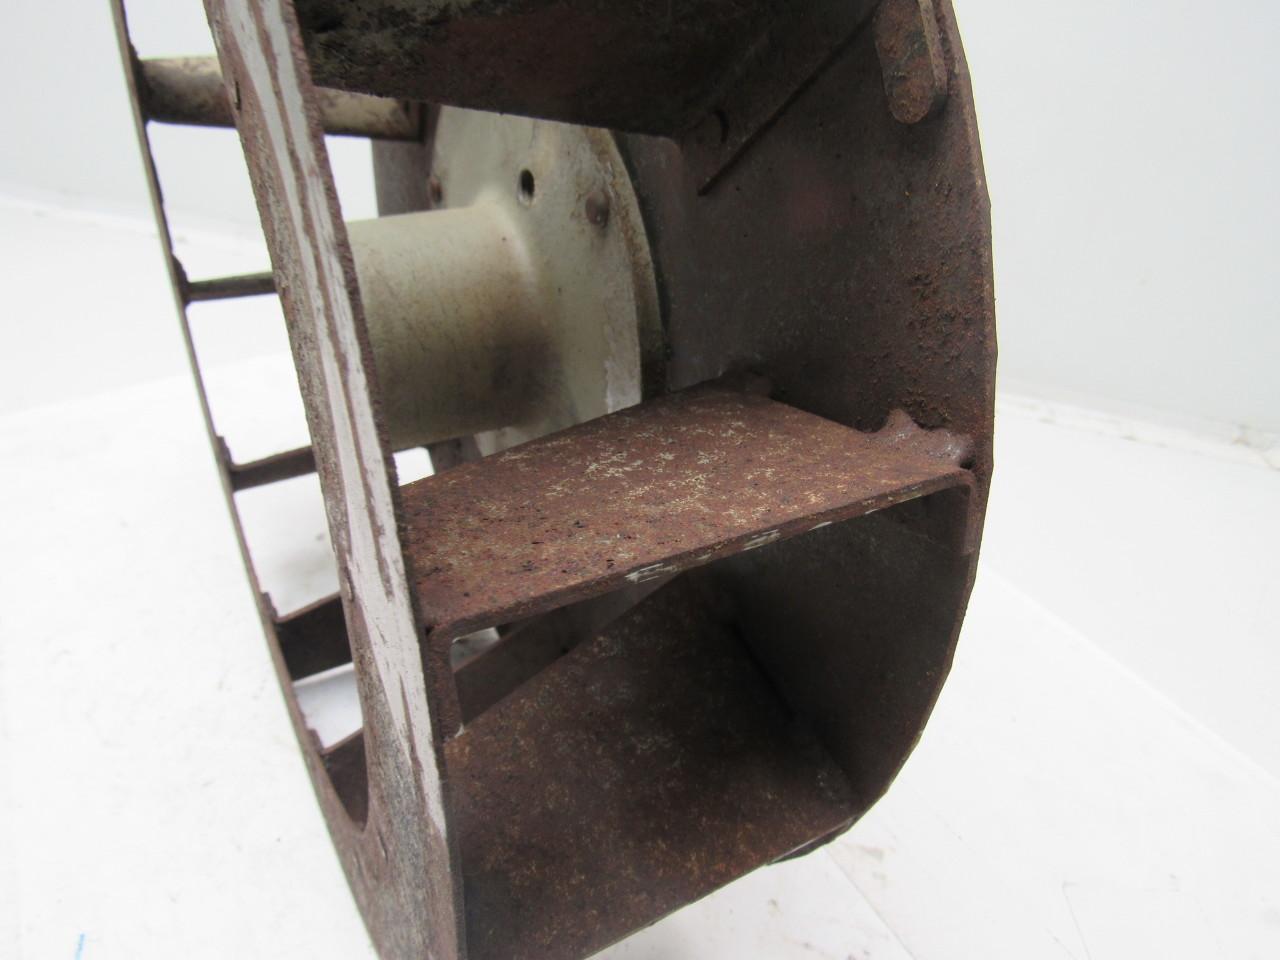 Dust Collector Blower : Torit quot x dust collector blower fan